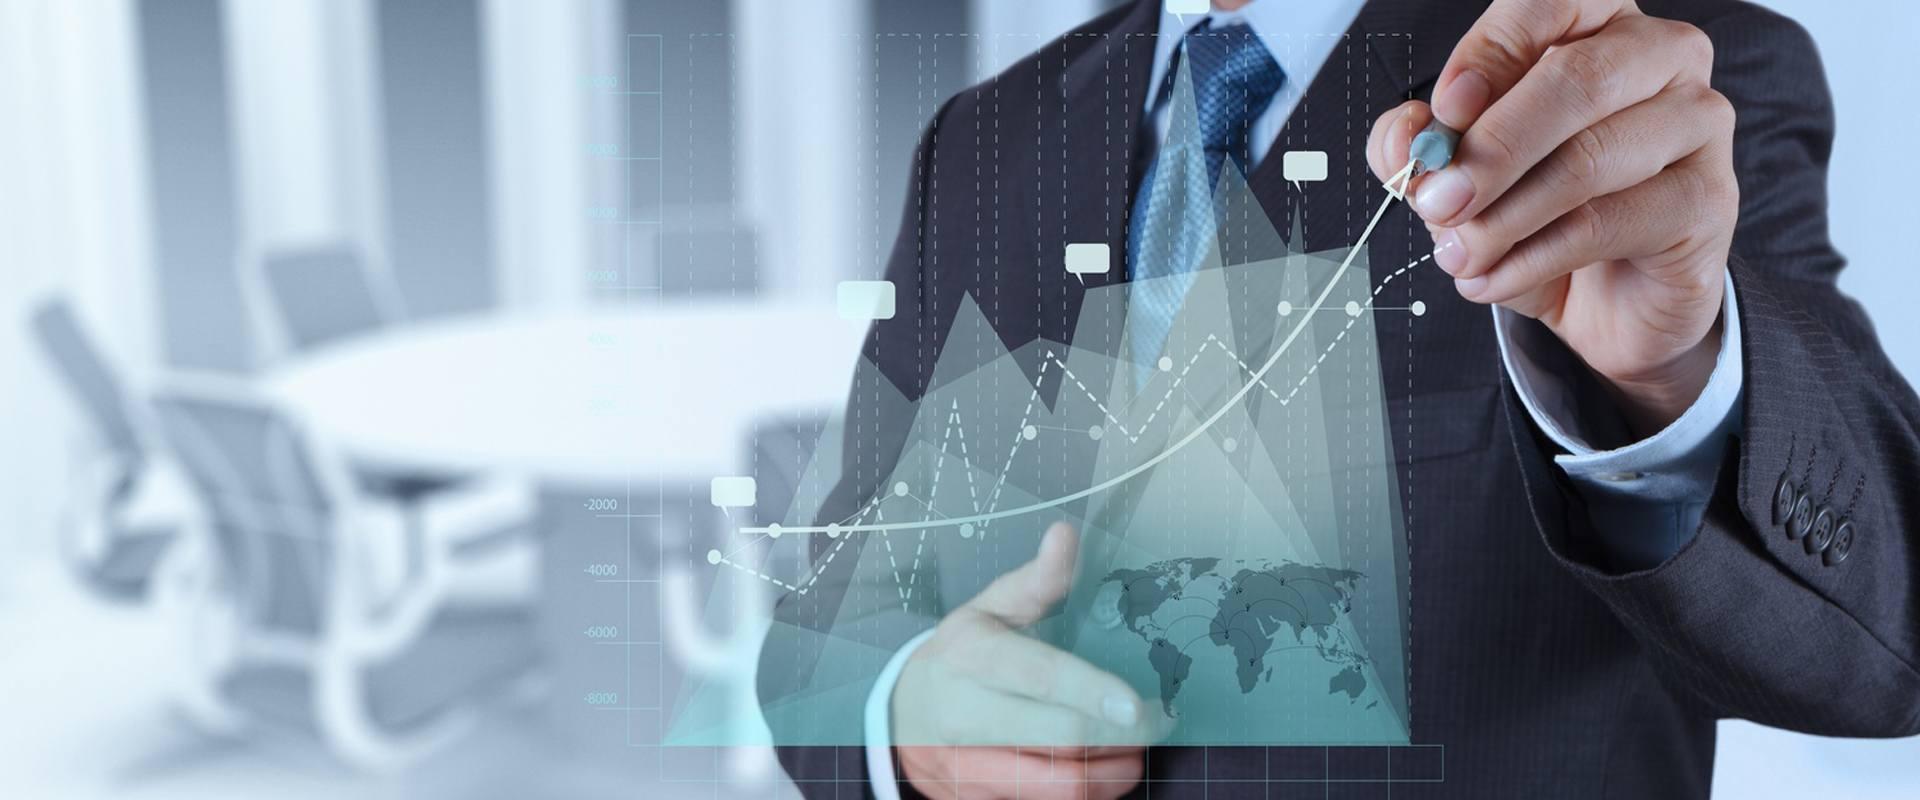 autoketing-tactics-boost-ecommerce-revenue-upsell-cross-sell-1